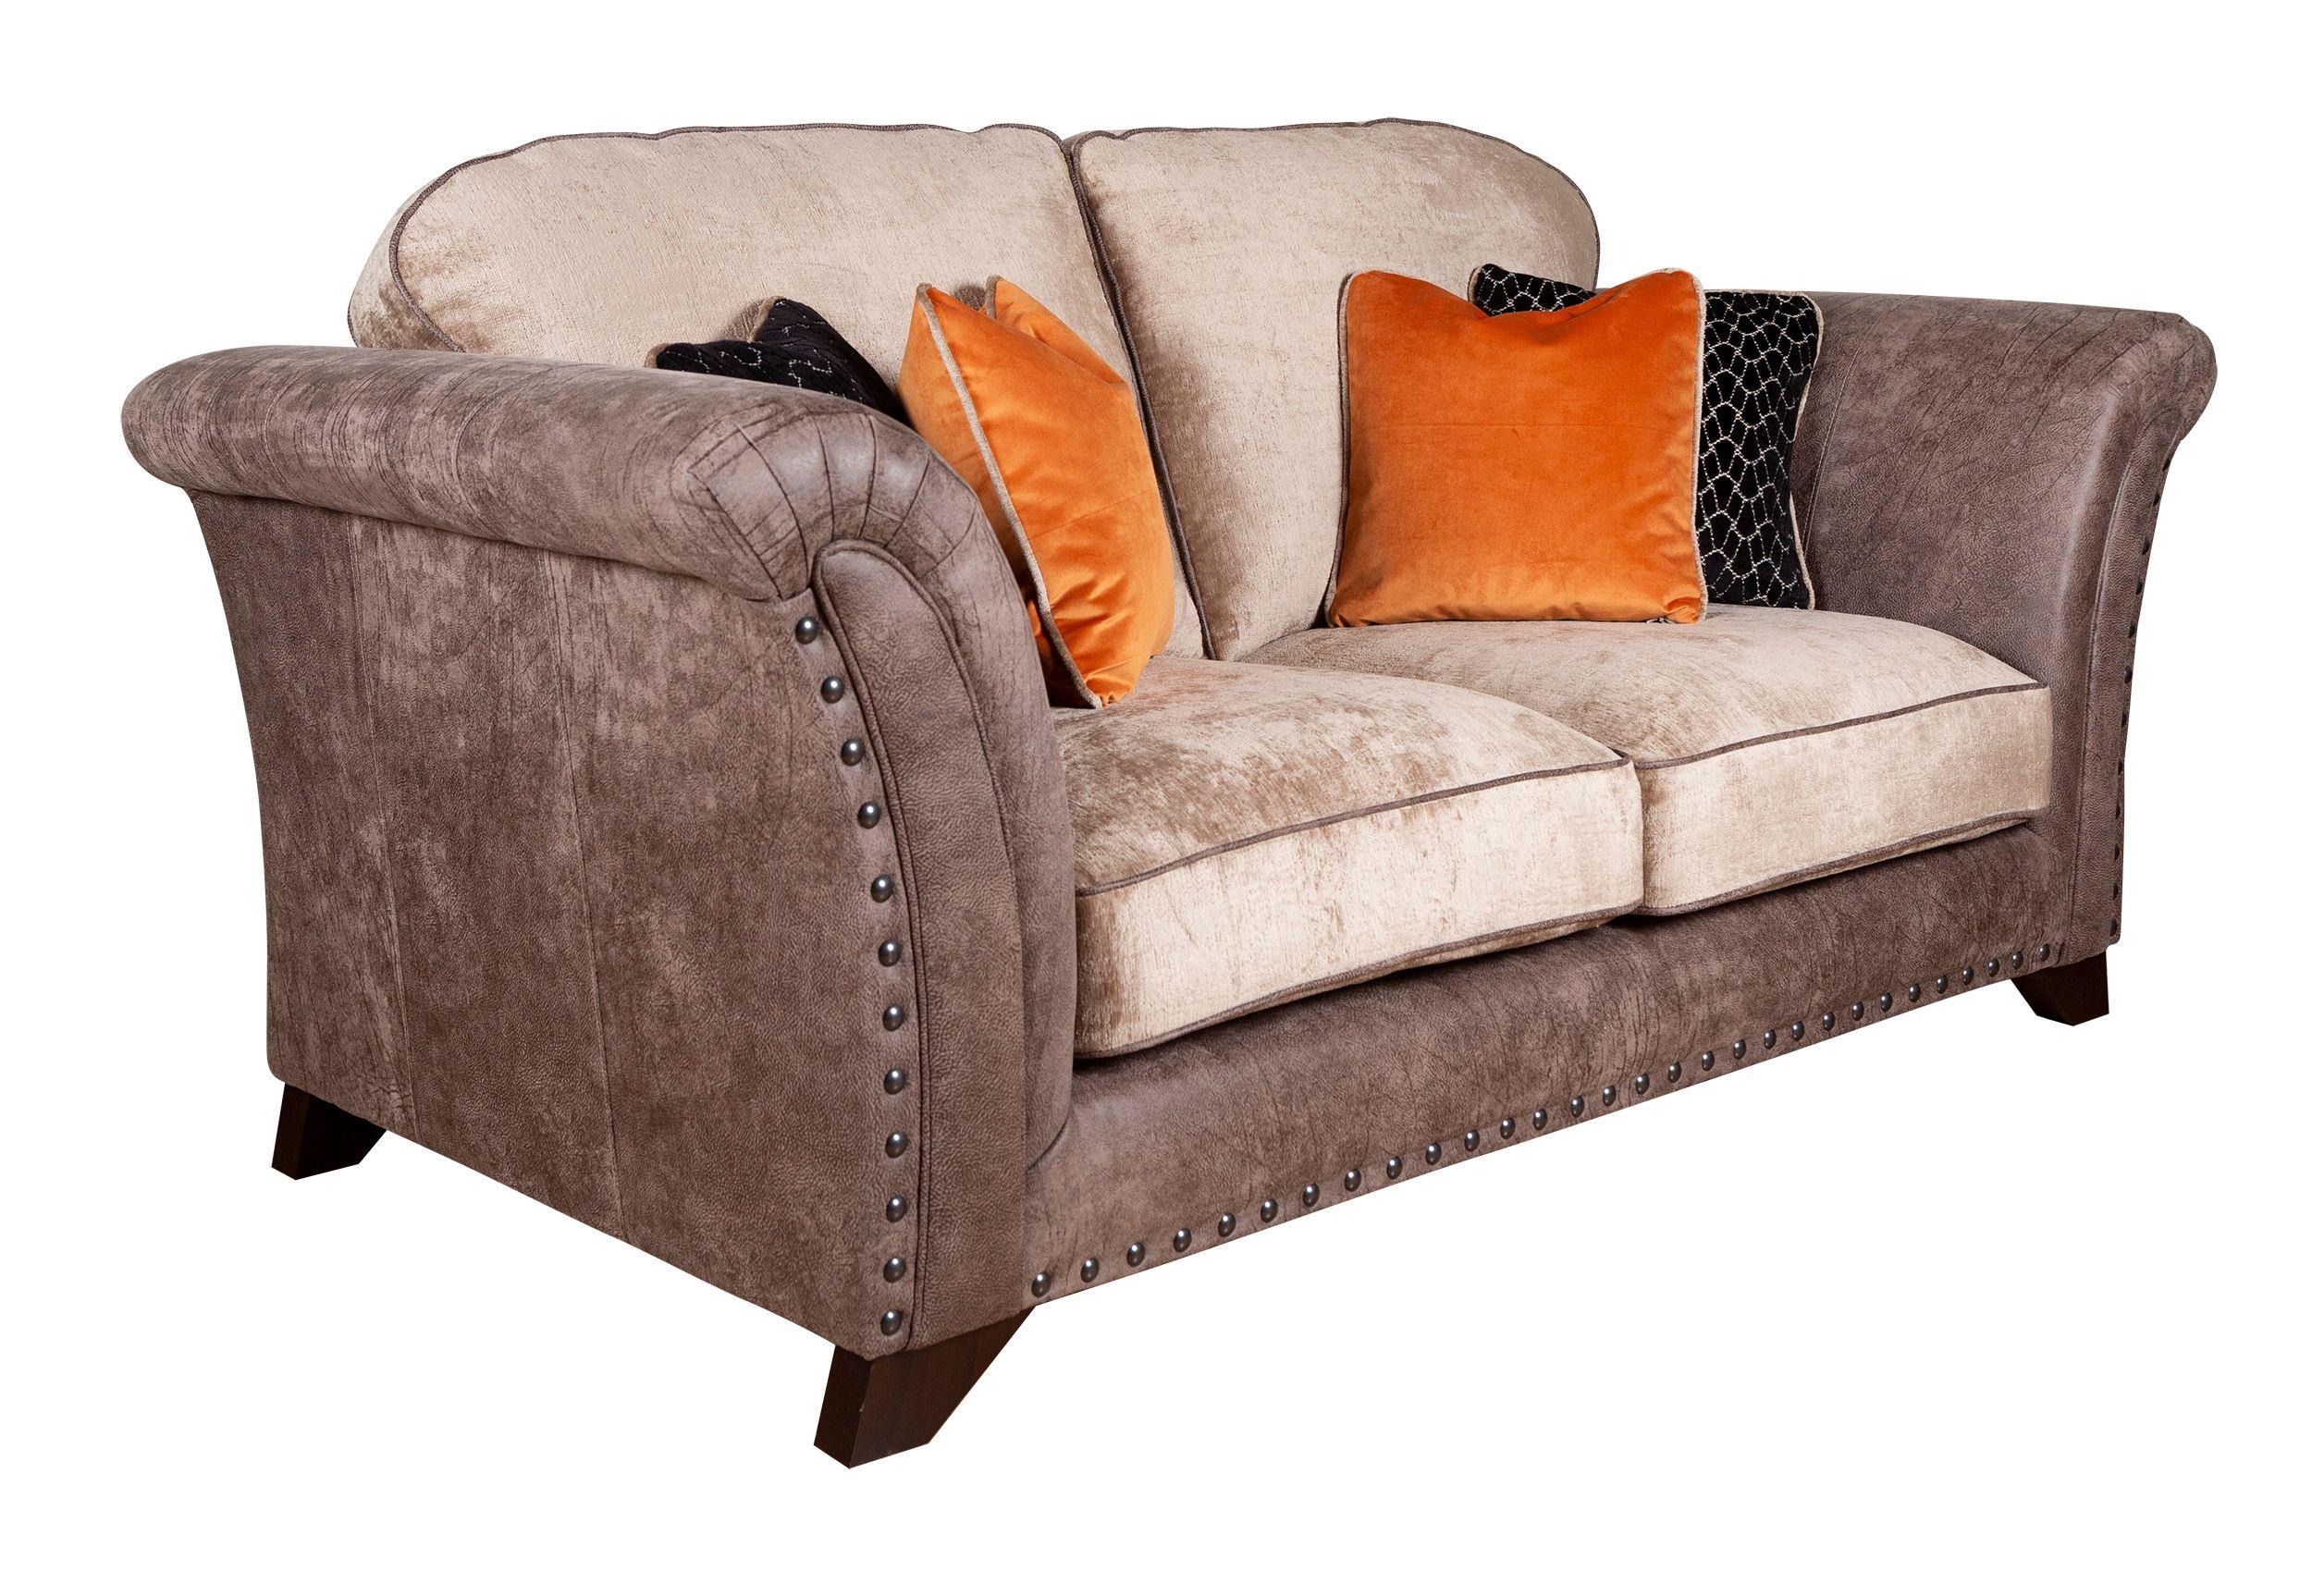 WESTMINSTER Standard Back 4 Seater Modular Sofa